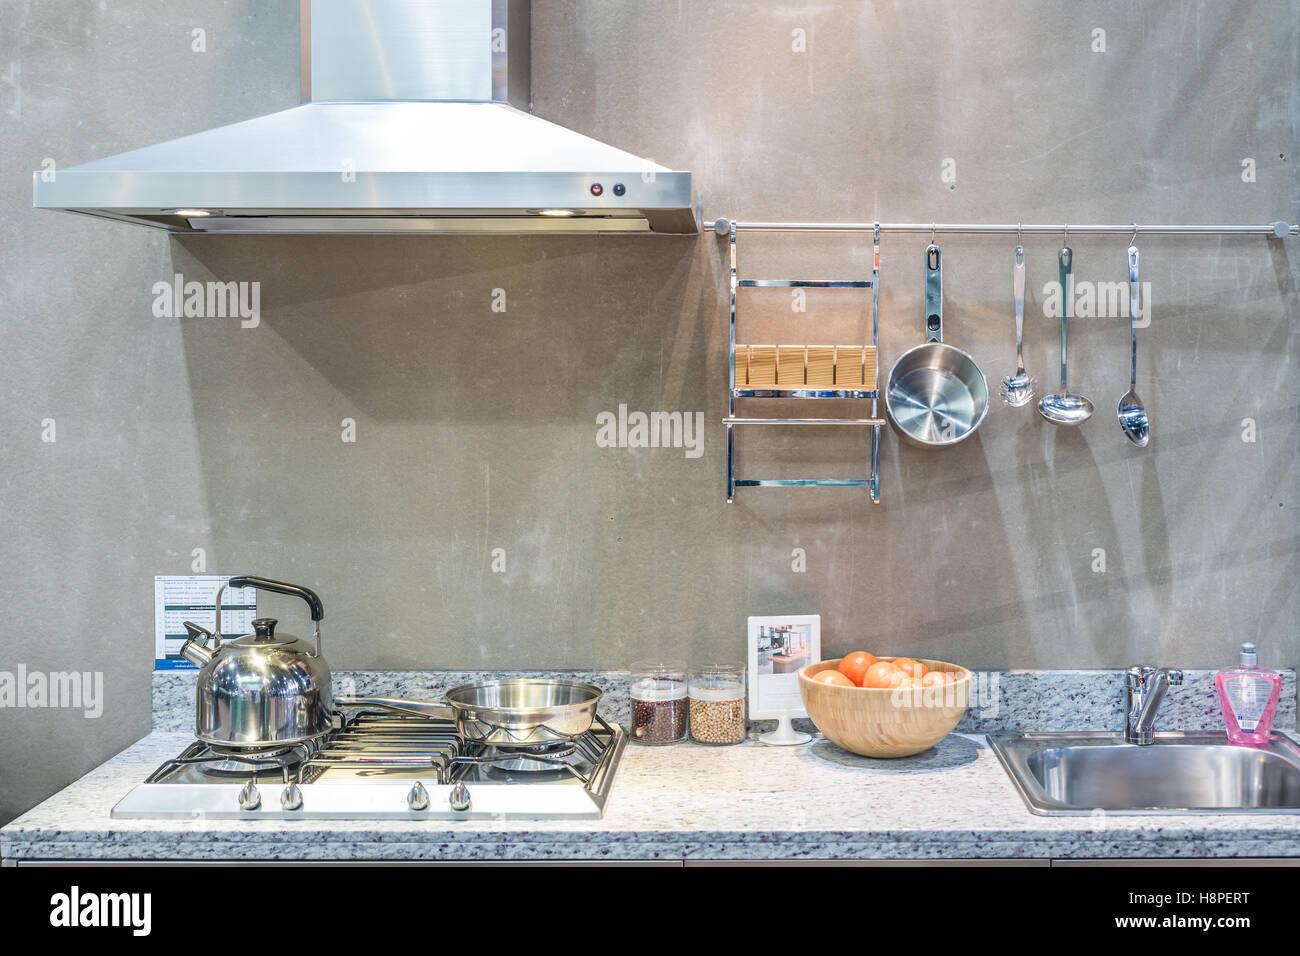 Siemens lc jhm wall mounted cooker hood schwarz edelstahl